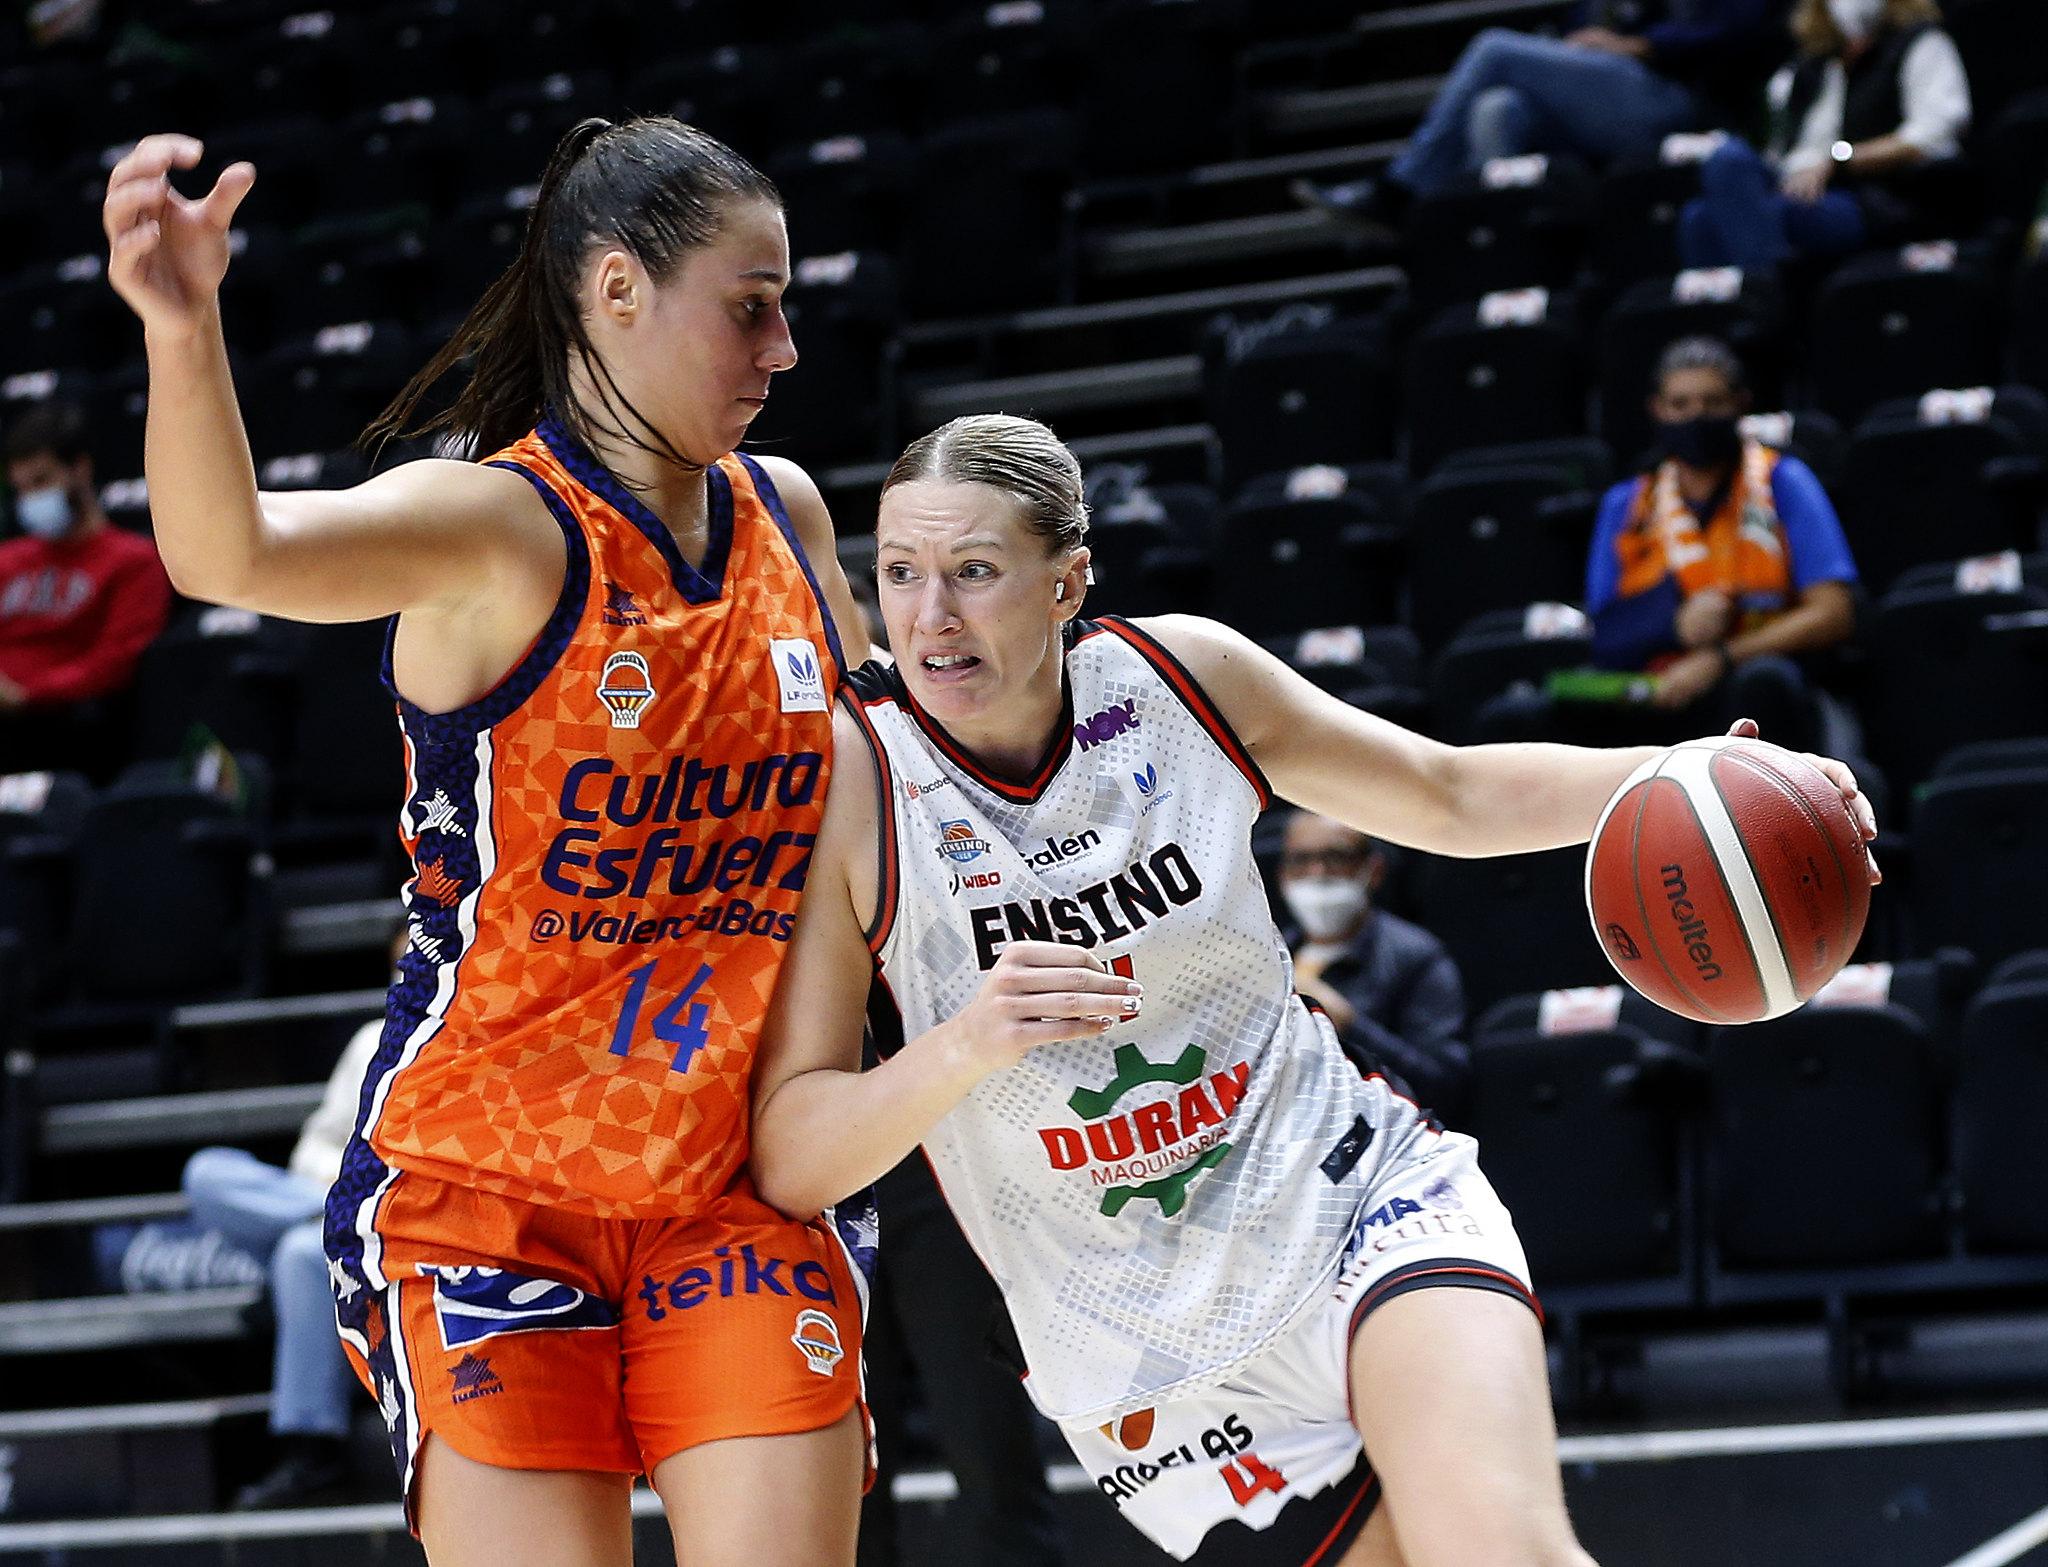 Raquel Carrera no Valencia Basket vs Ensino / FEB